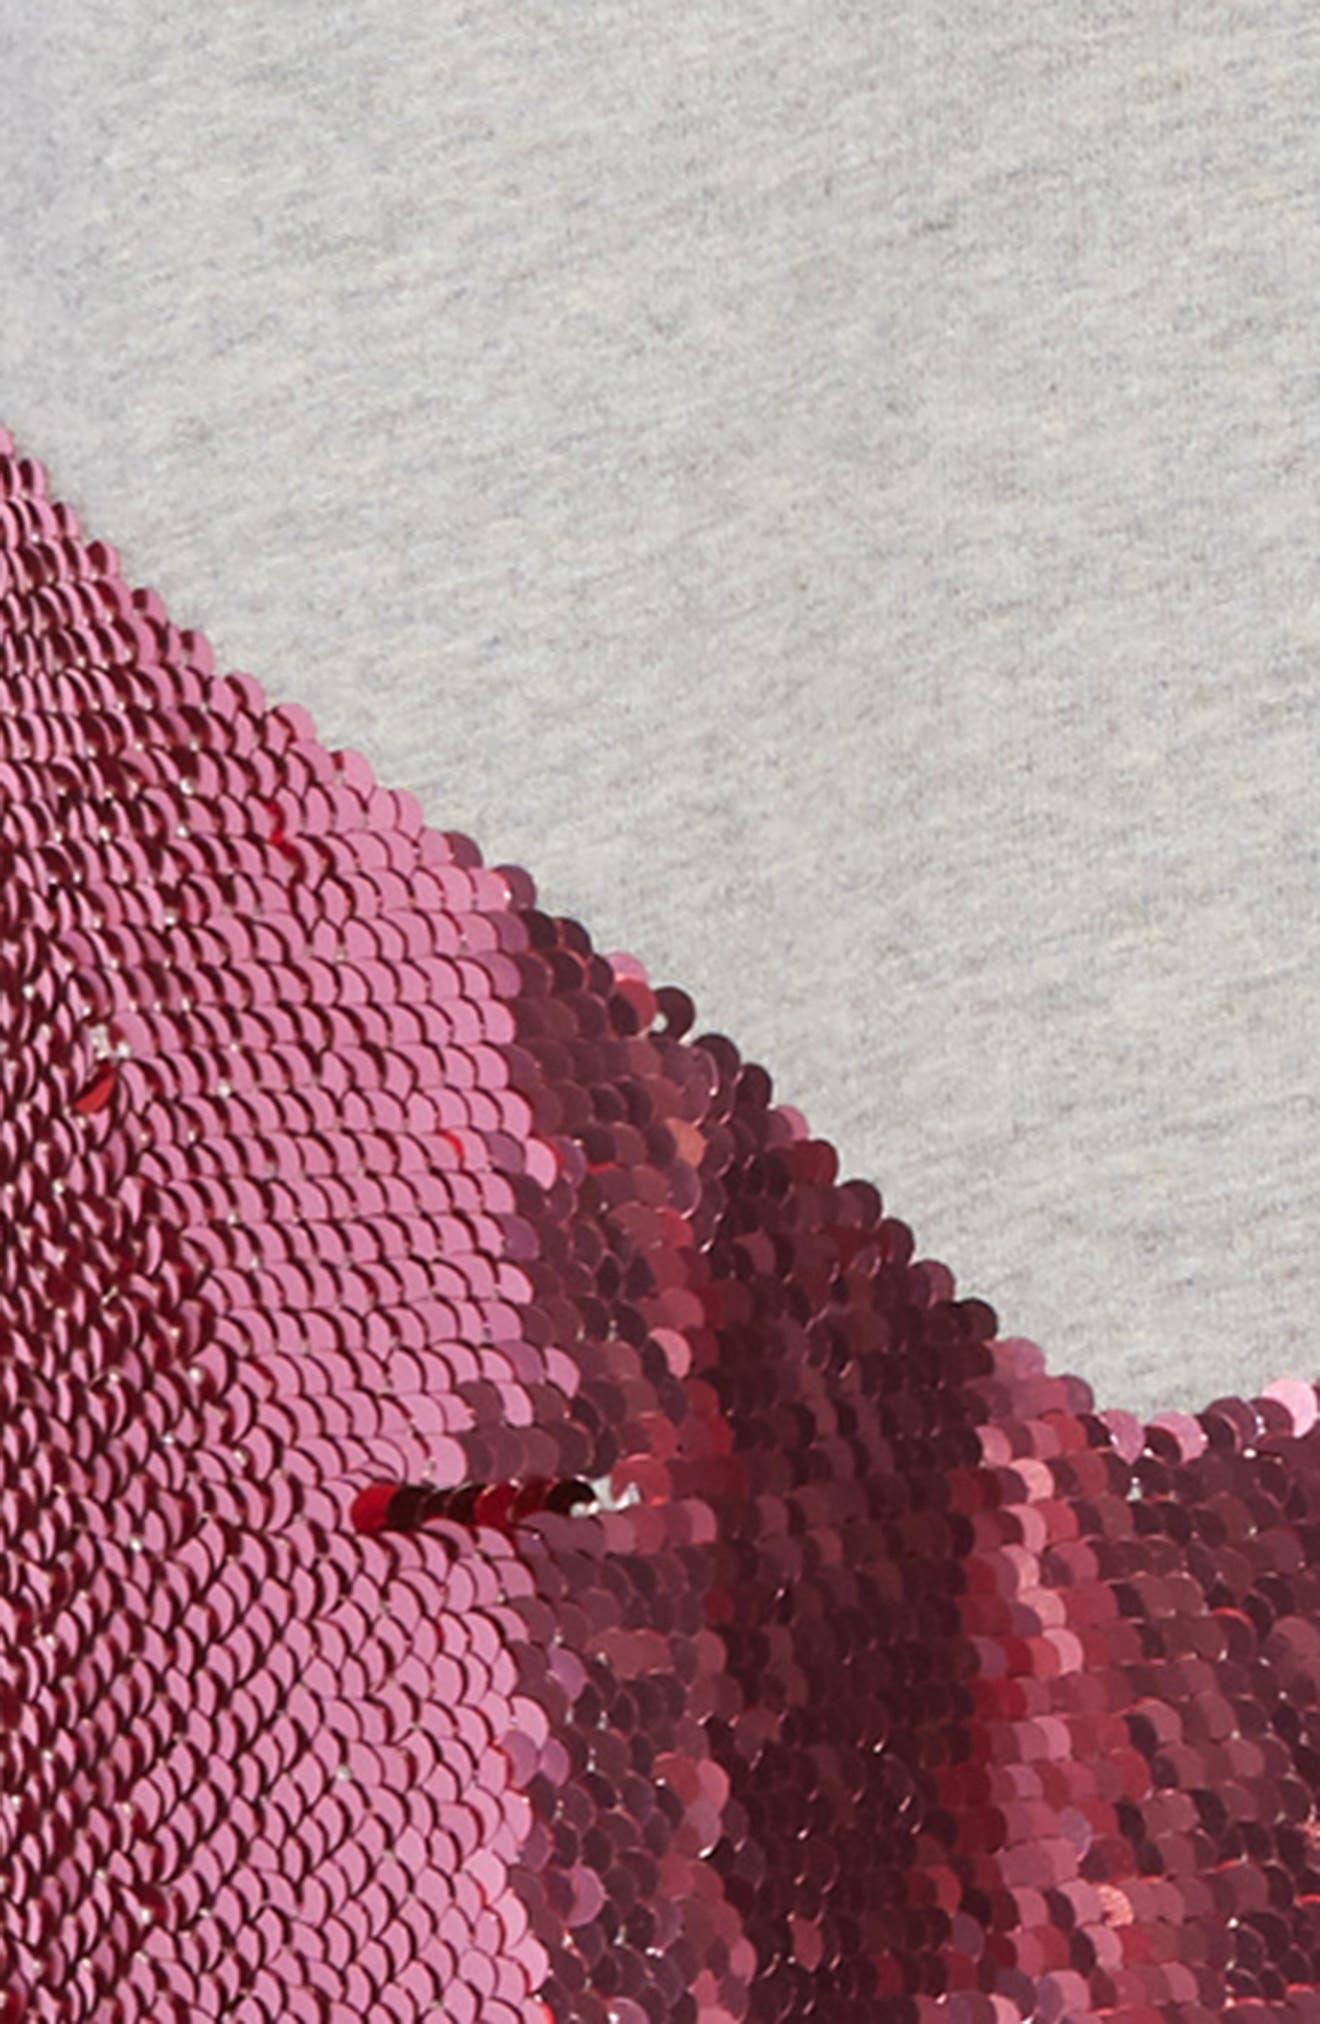 Shimmer Flip Sequin Star T-Shirt Dress,                             Alternate thumbnail 4, color,                             GRY GREY MARL/ RAINBOW SEQUINS